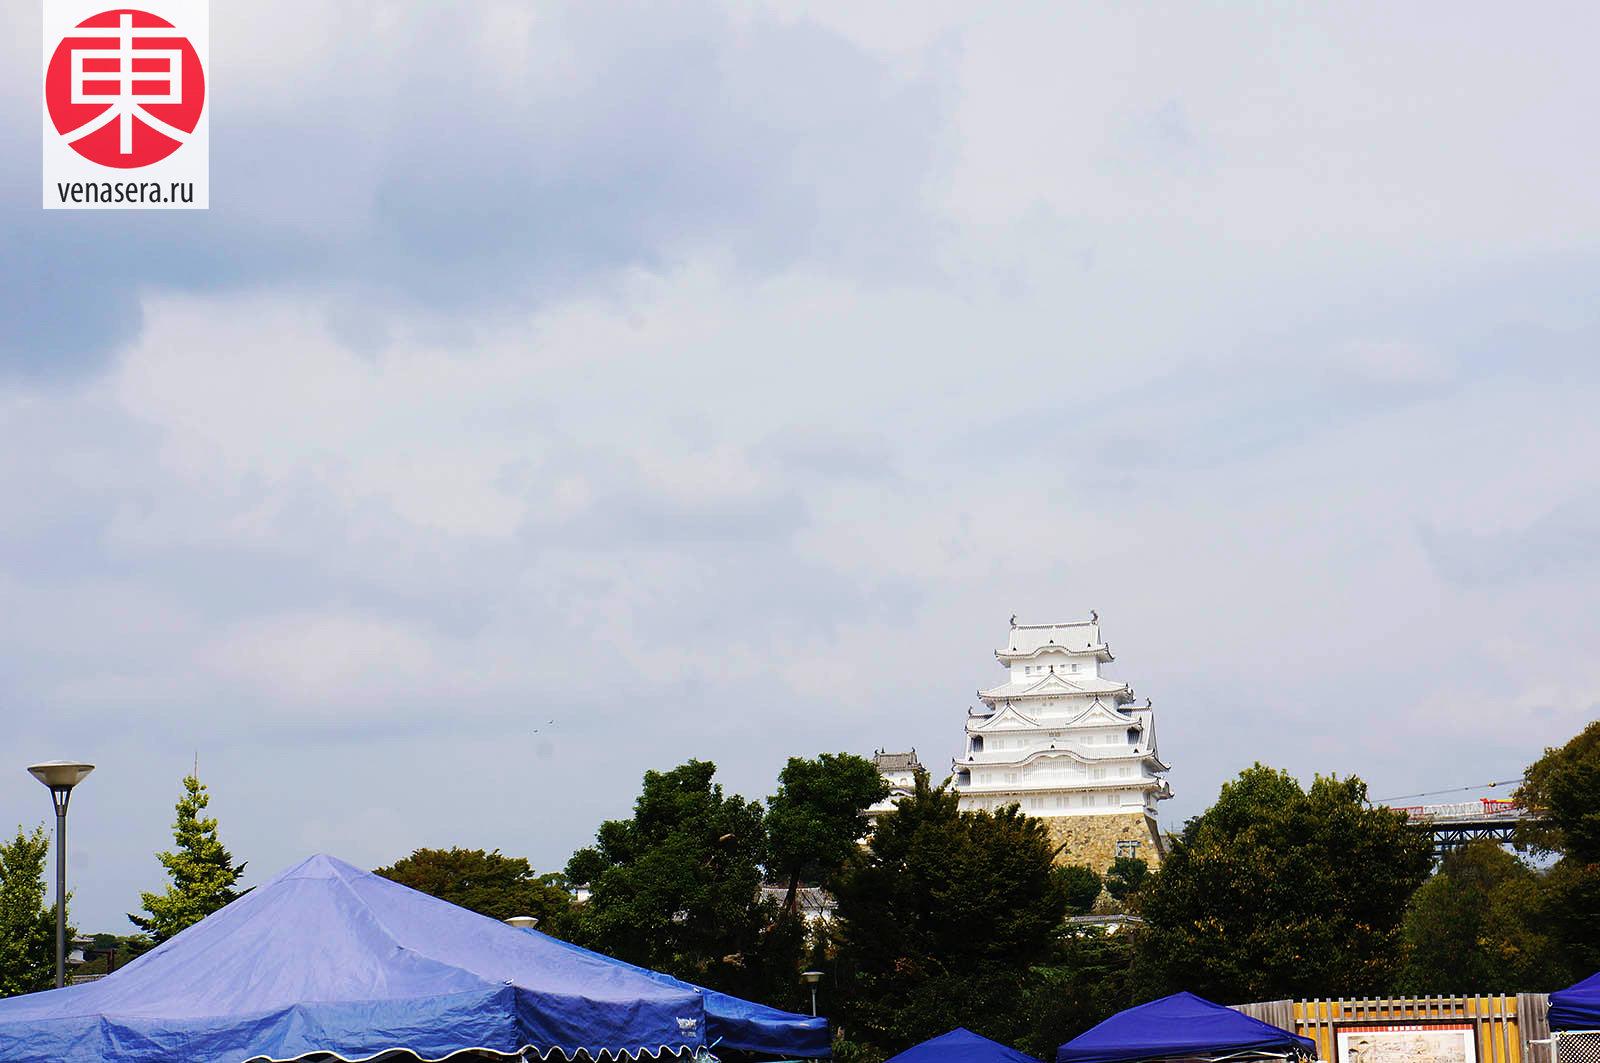 Замок Химэдзи, Himeji-jo, 姫路城, Замок Сирасаги, Shirasagi-jo, 白鷺城, Химэдзи, Himeji, 姫路, Хёго, Hyogo, 兵庫県, Хонсю, Honshu, 本州, Япония, Japan, 日本.